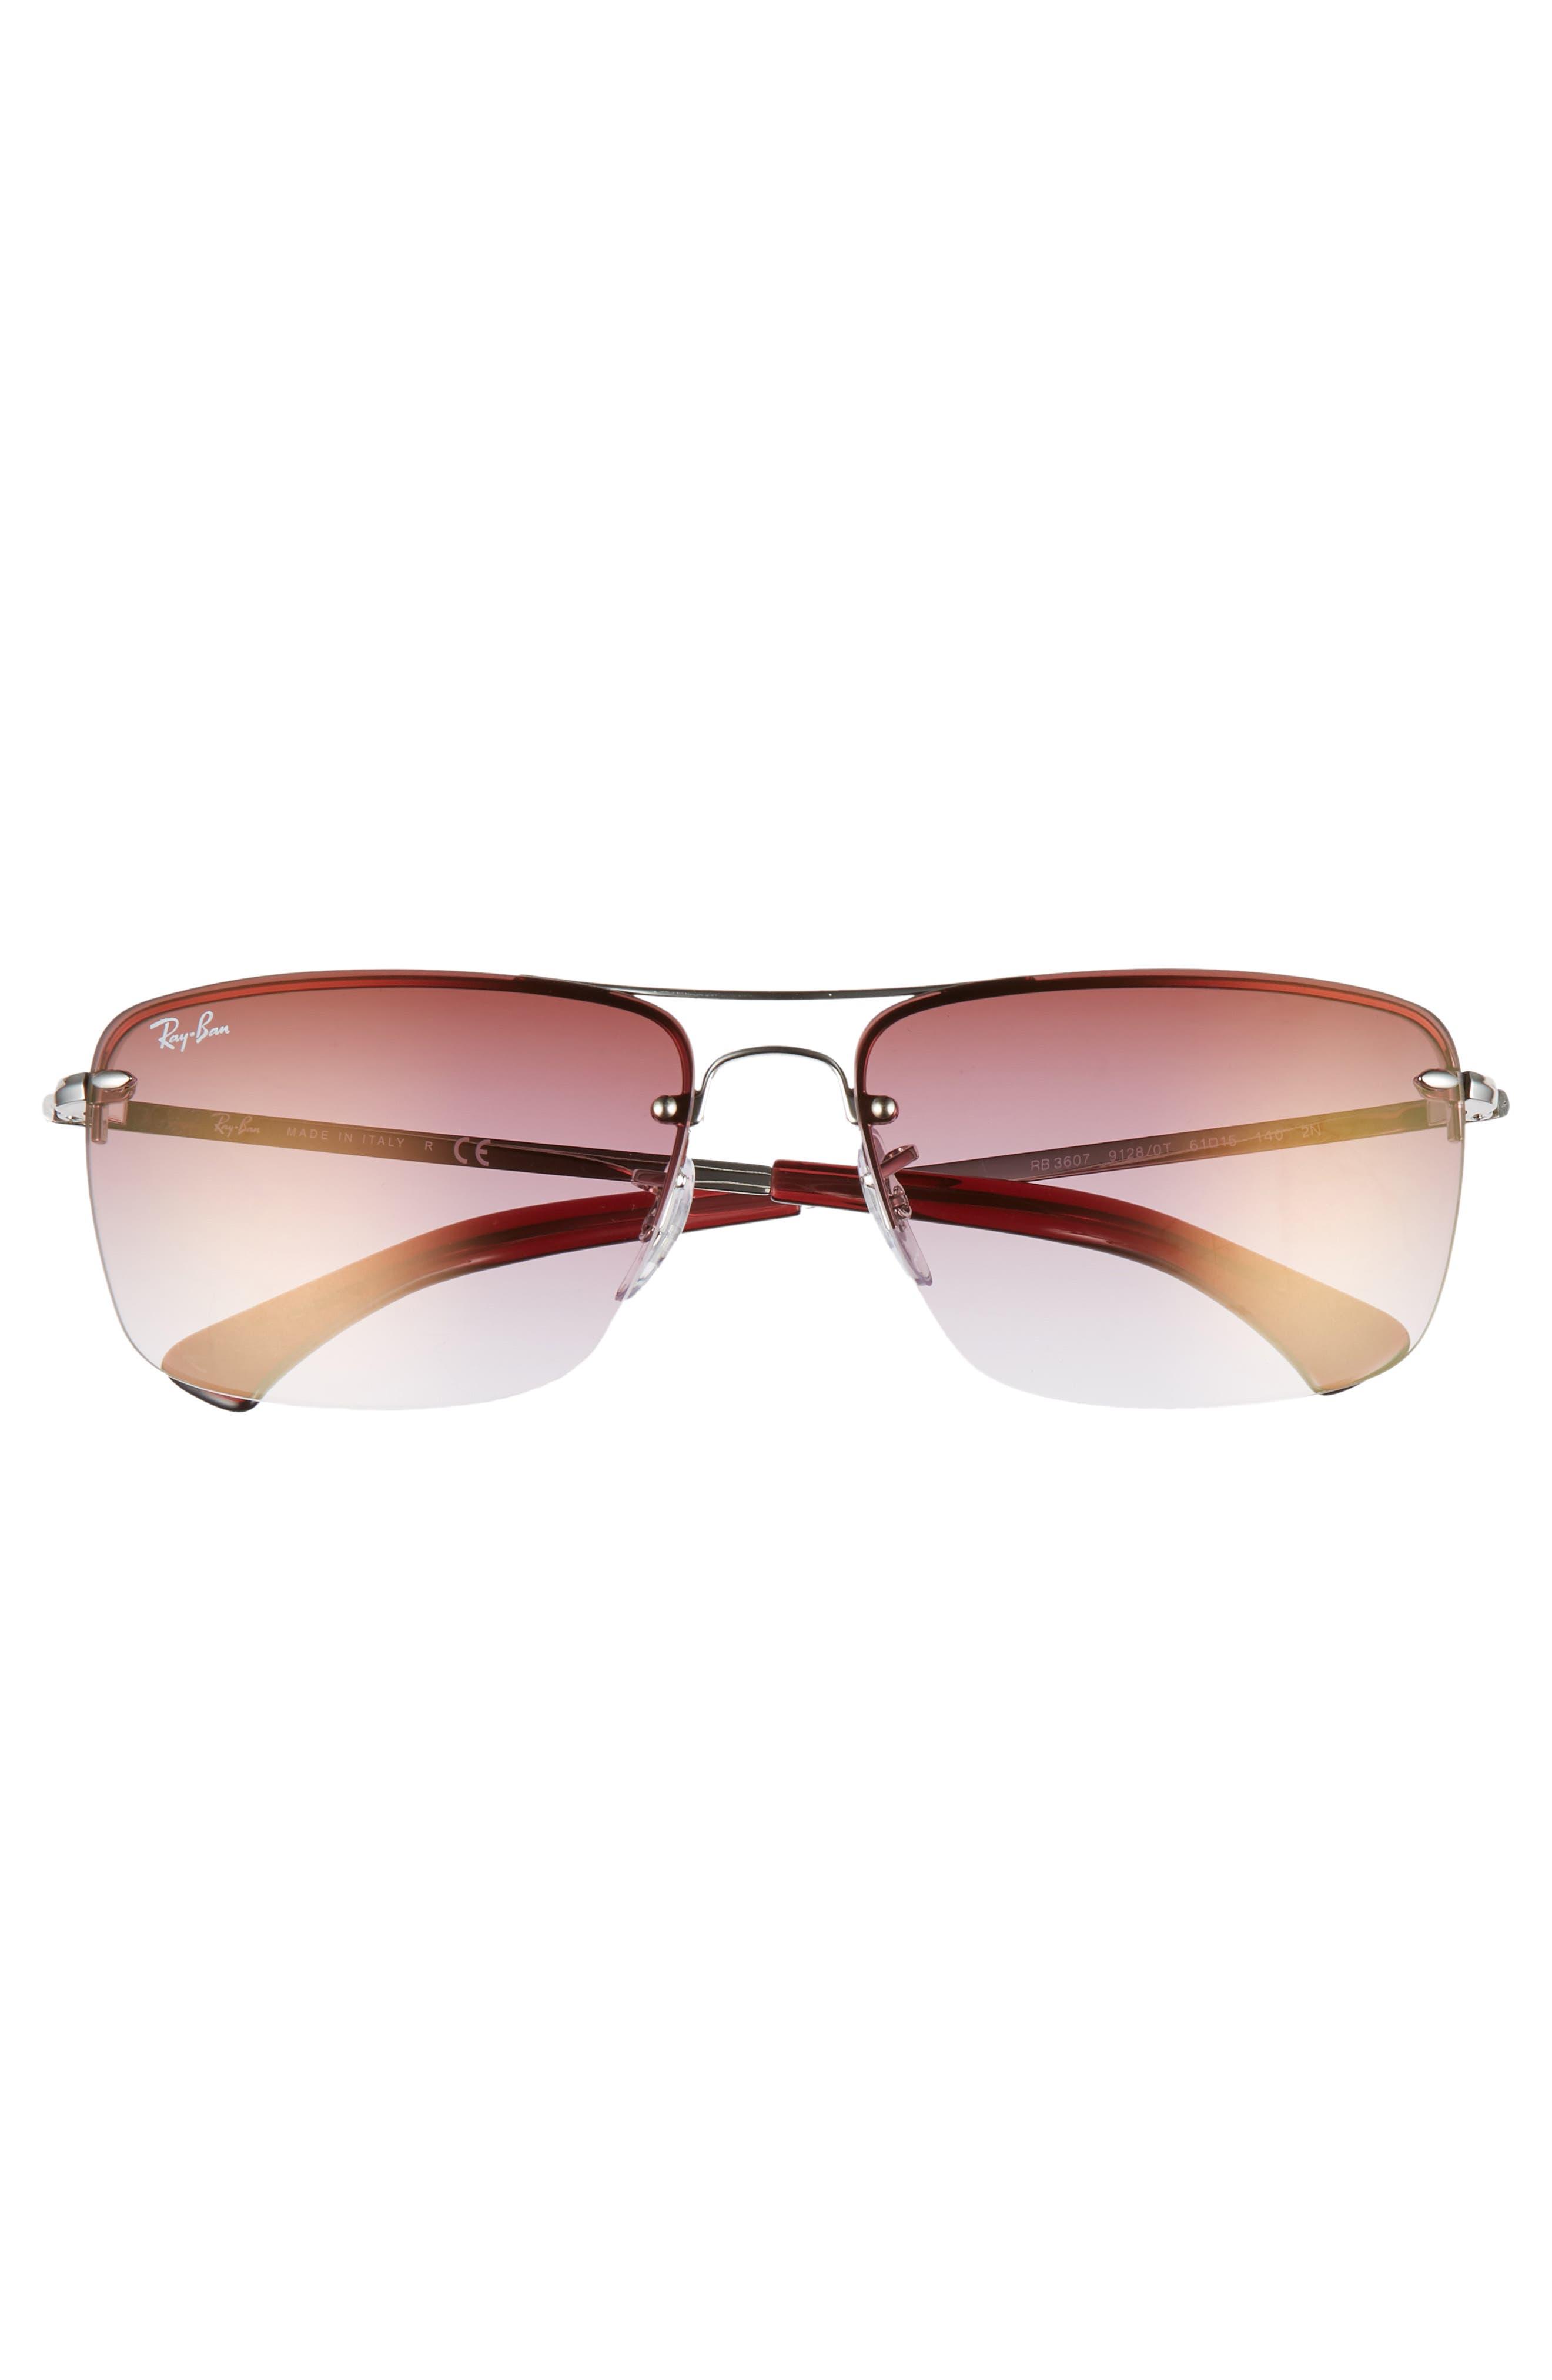 61mm Rimless Navigator Sunglasses,                             Alternate thumbnail 3, color,                             SILVER/ BORDEAUX GRADIENT